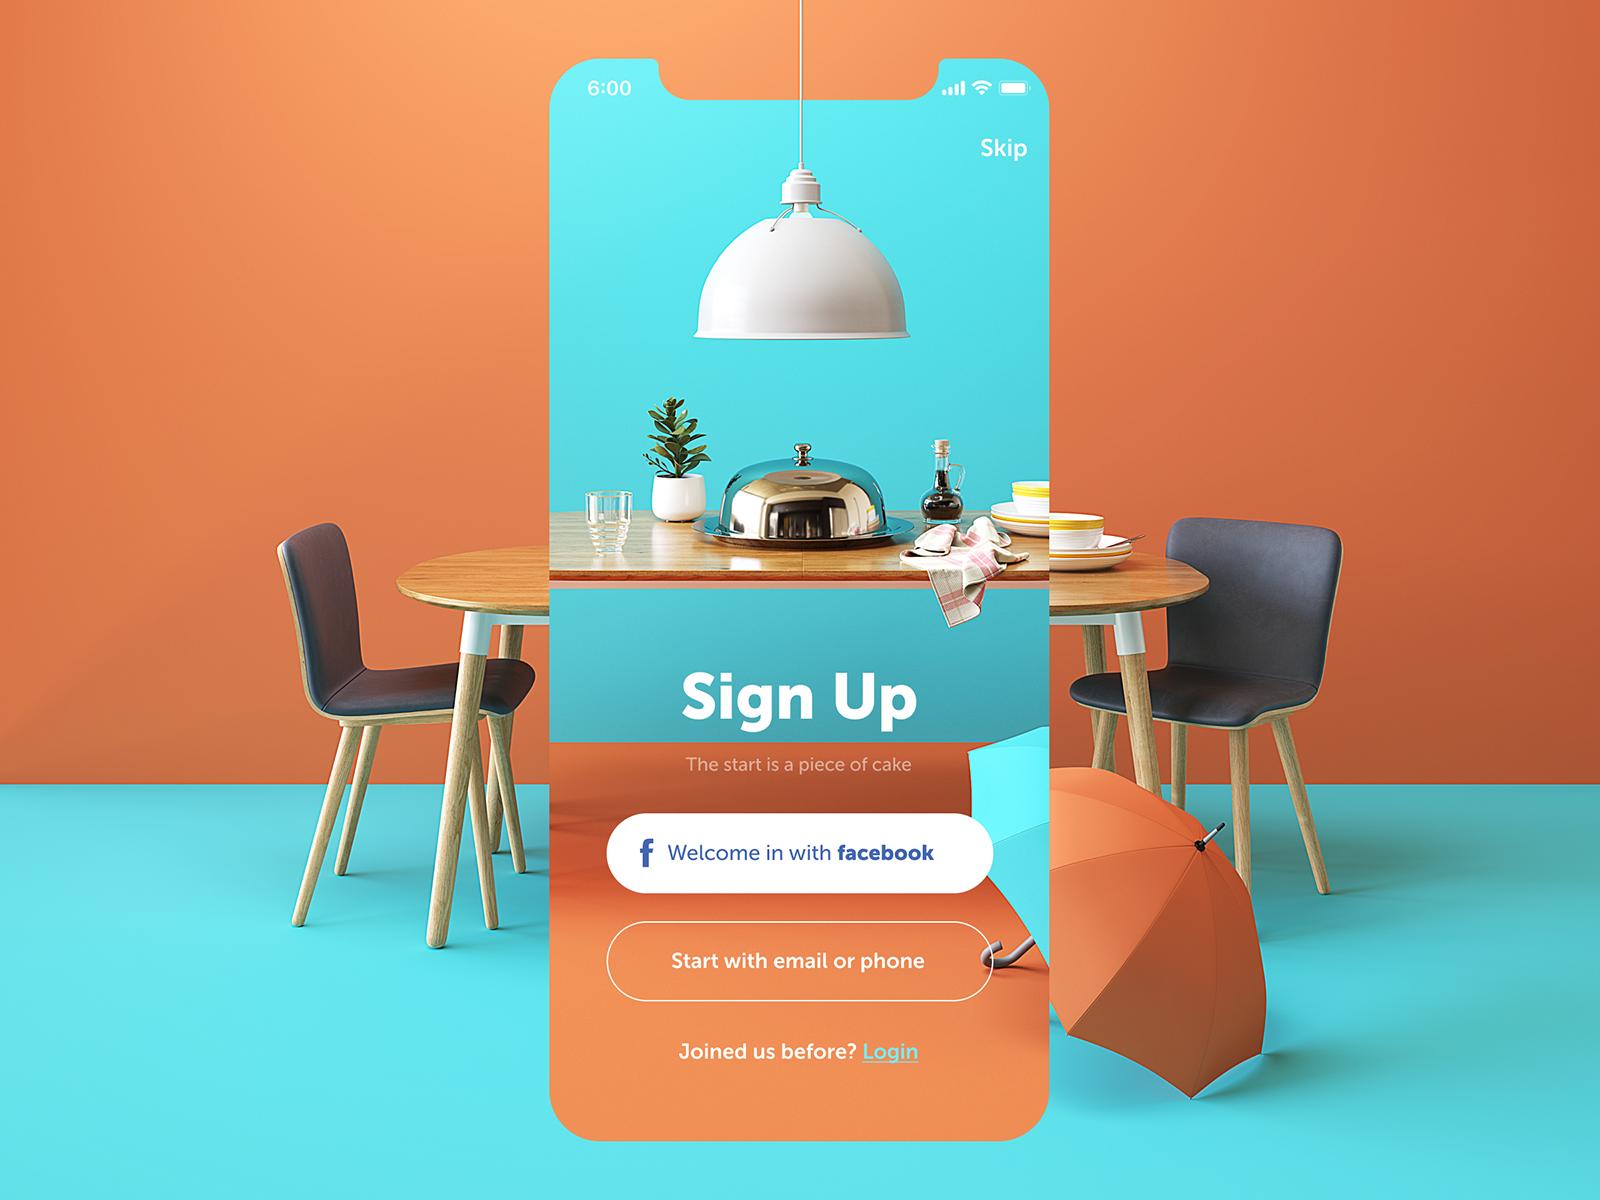 Restaurant app sign up screen design tubik